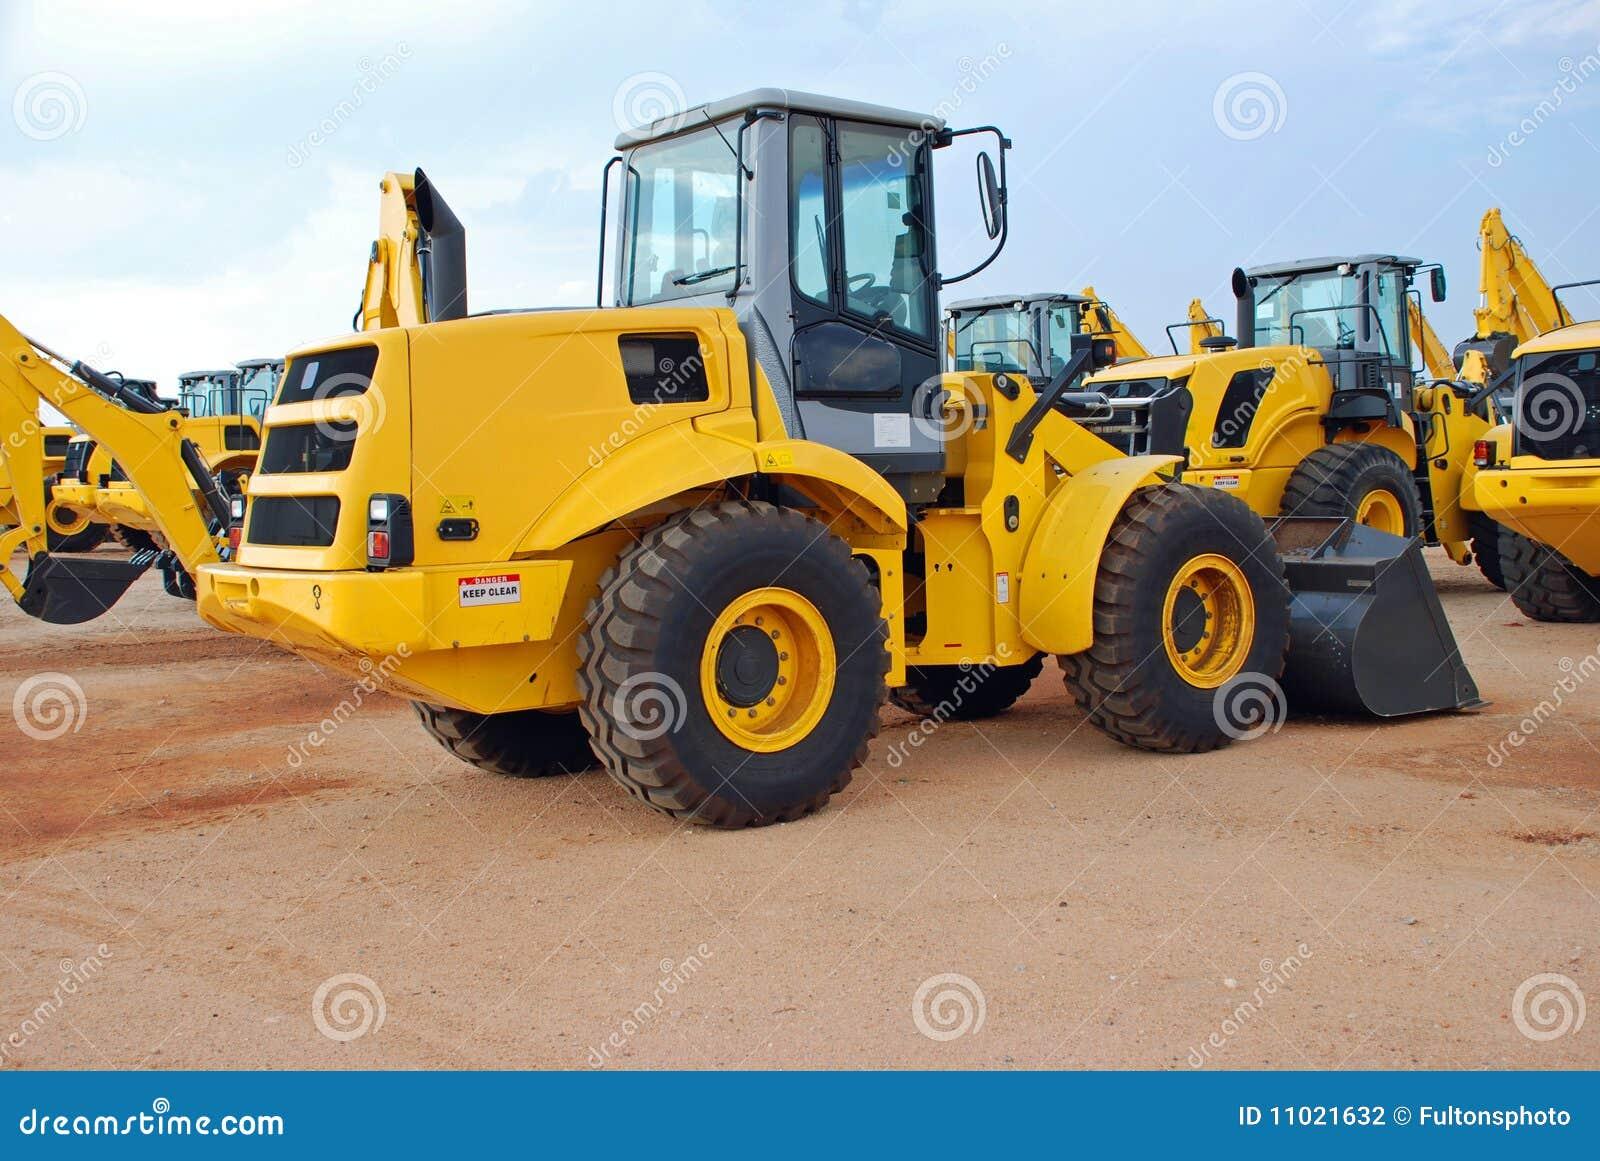 Bulldozer Construction Vehicles